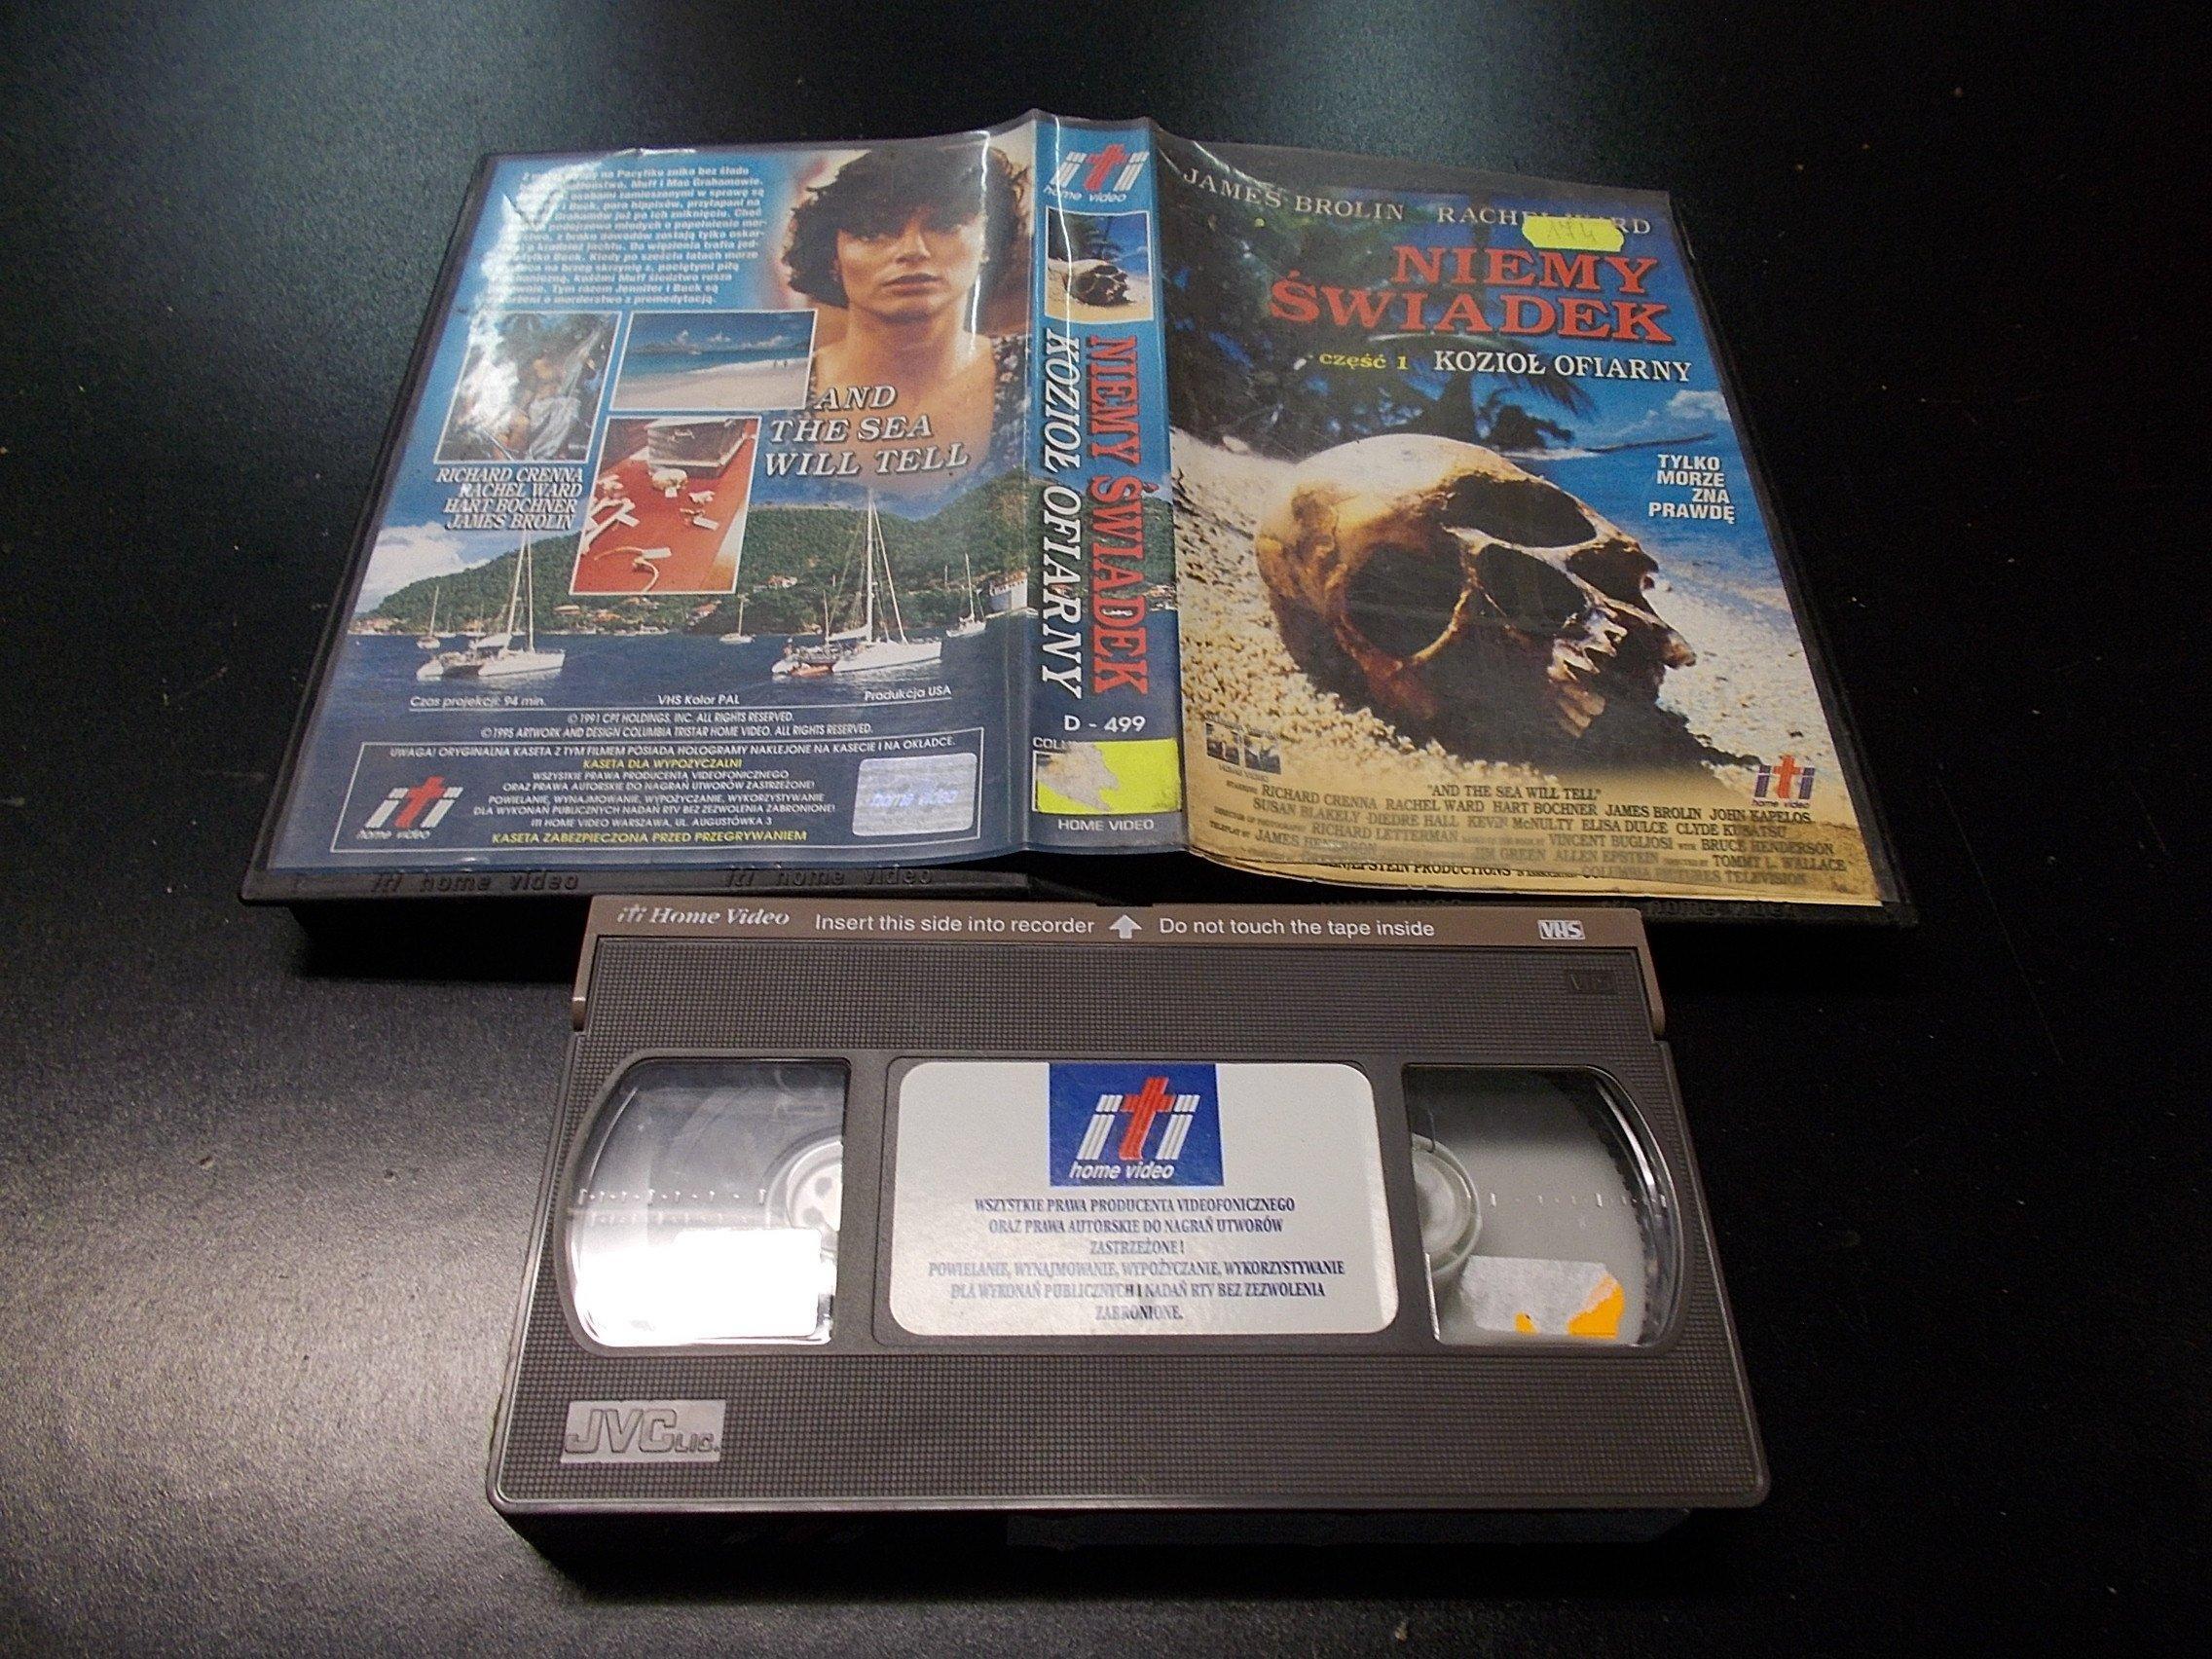 NIEMY ŚWIADEK 1 -  kaseta Video VHS - 1319 Opole - AlleOpole.pl